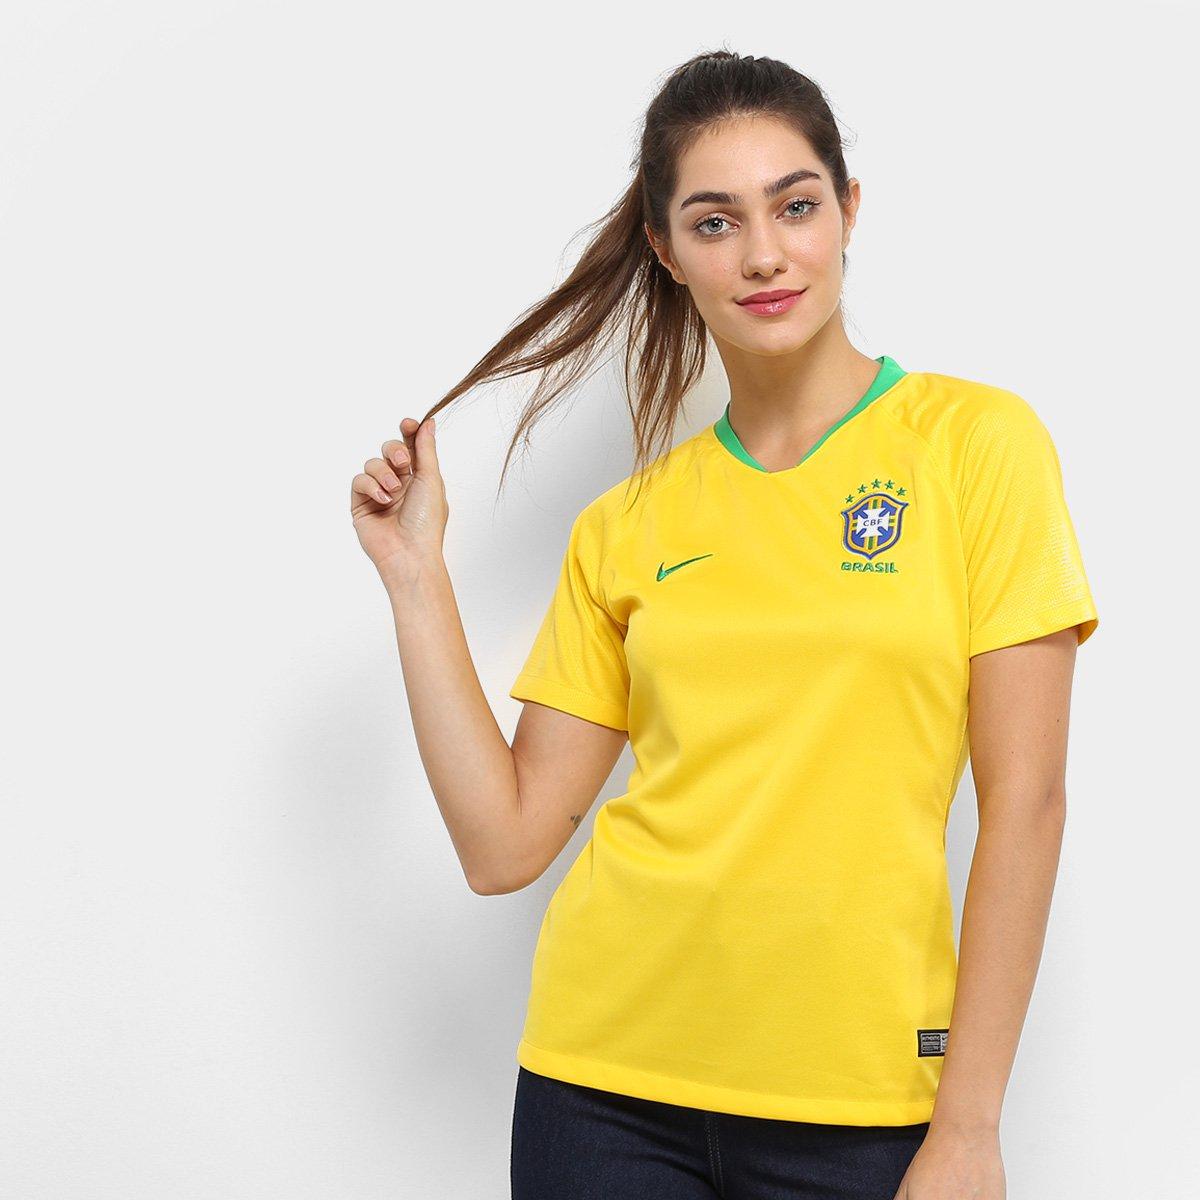 8d0ce6d24 20%OFF Camisa Seleção Brasil I 2018 s n° - Torcedor Nike Feminina